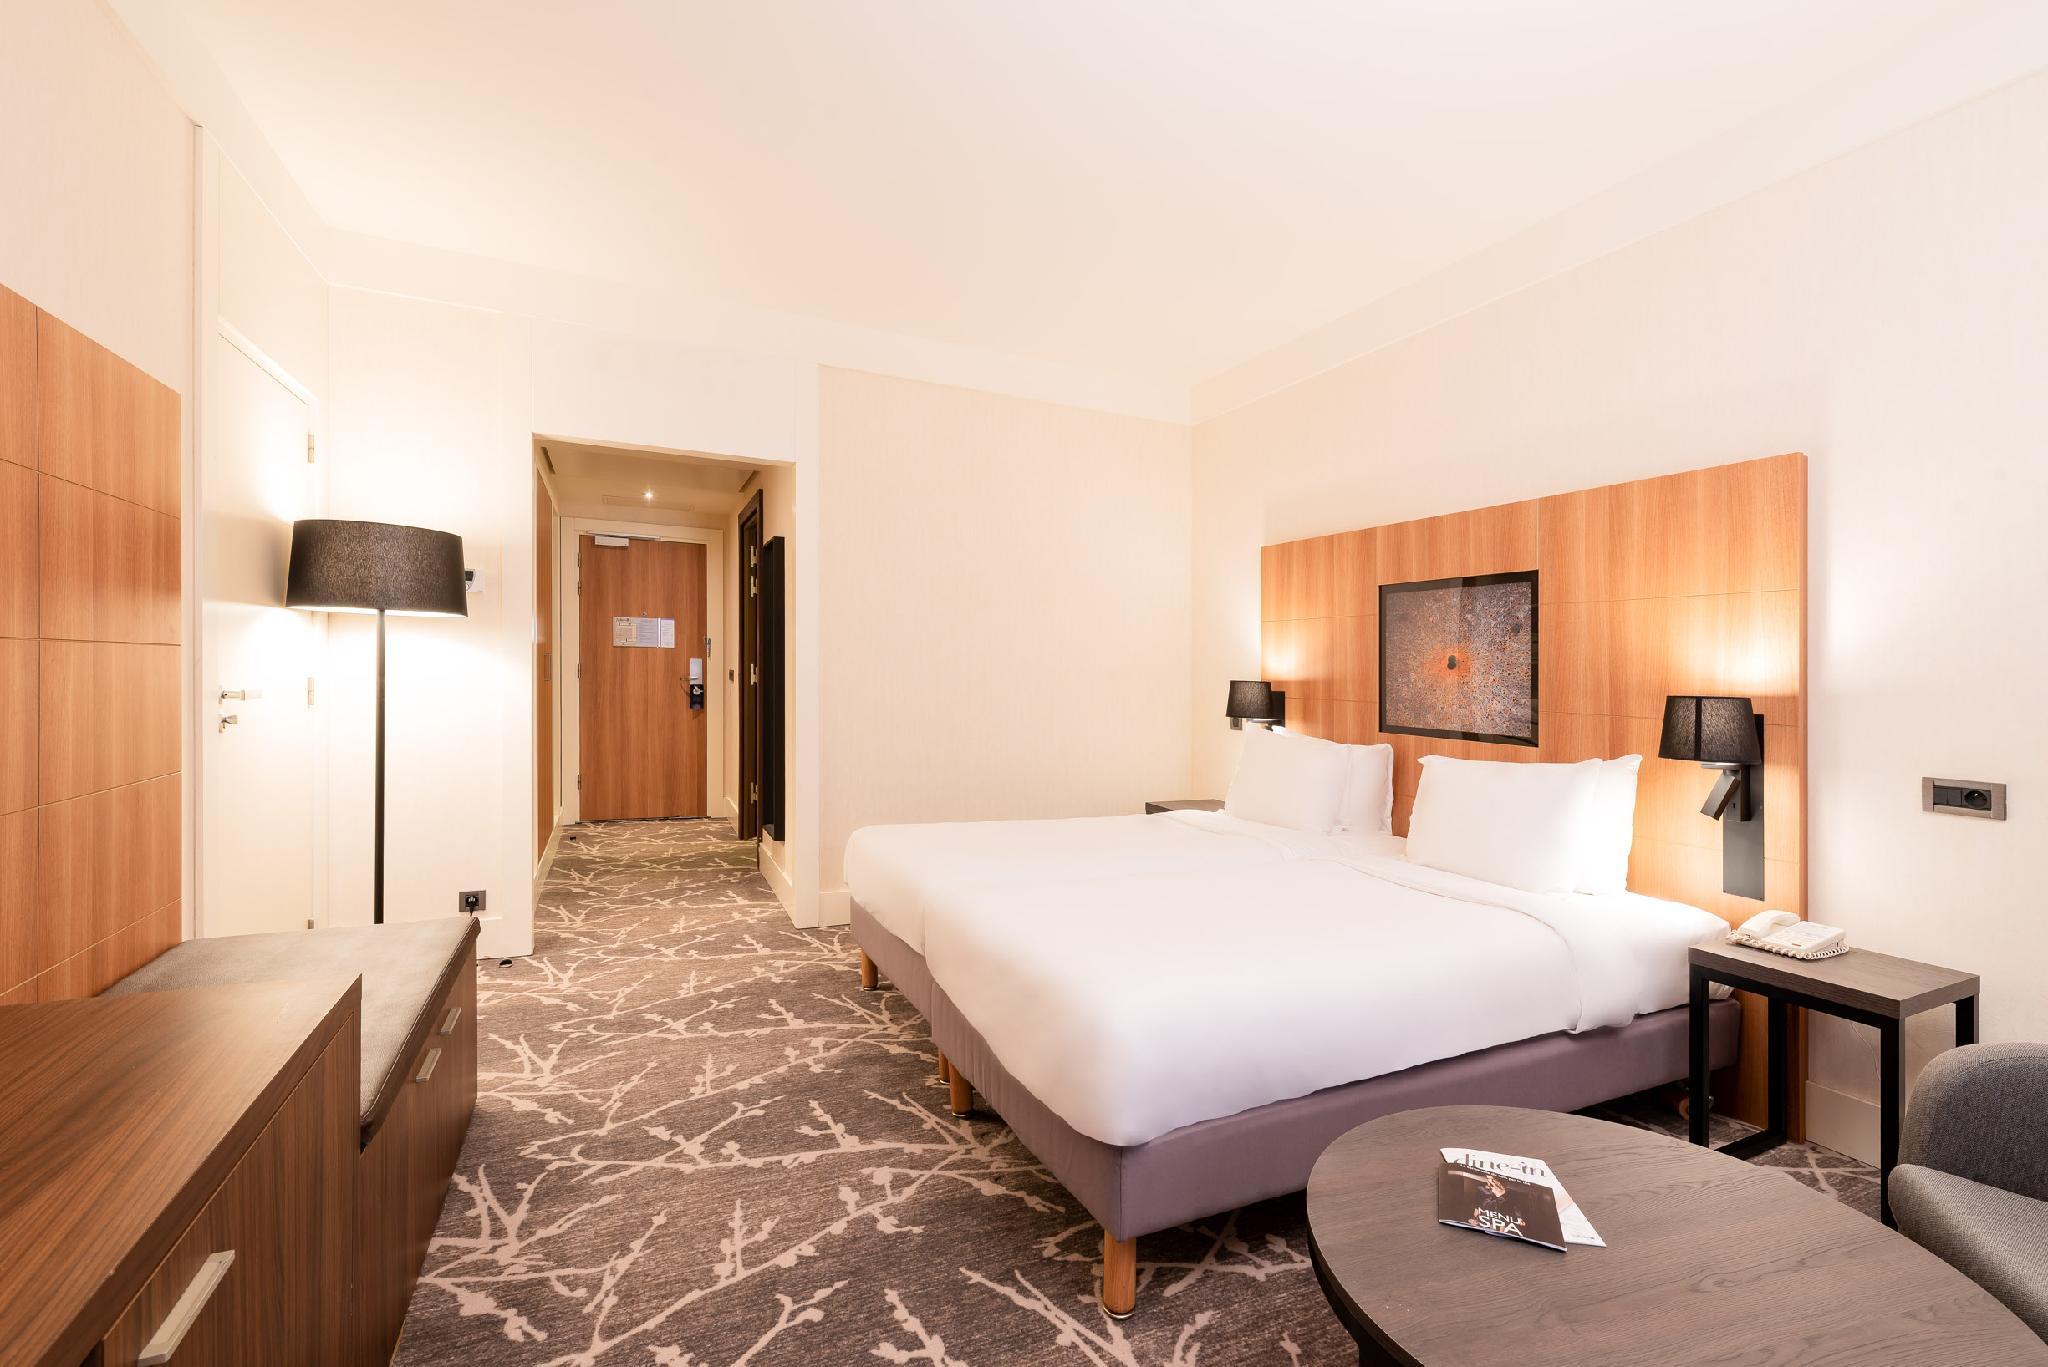 Radisson Blu Hotel Paris Marne La Vallee In France Room Deals Photos Reviews